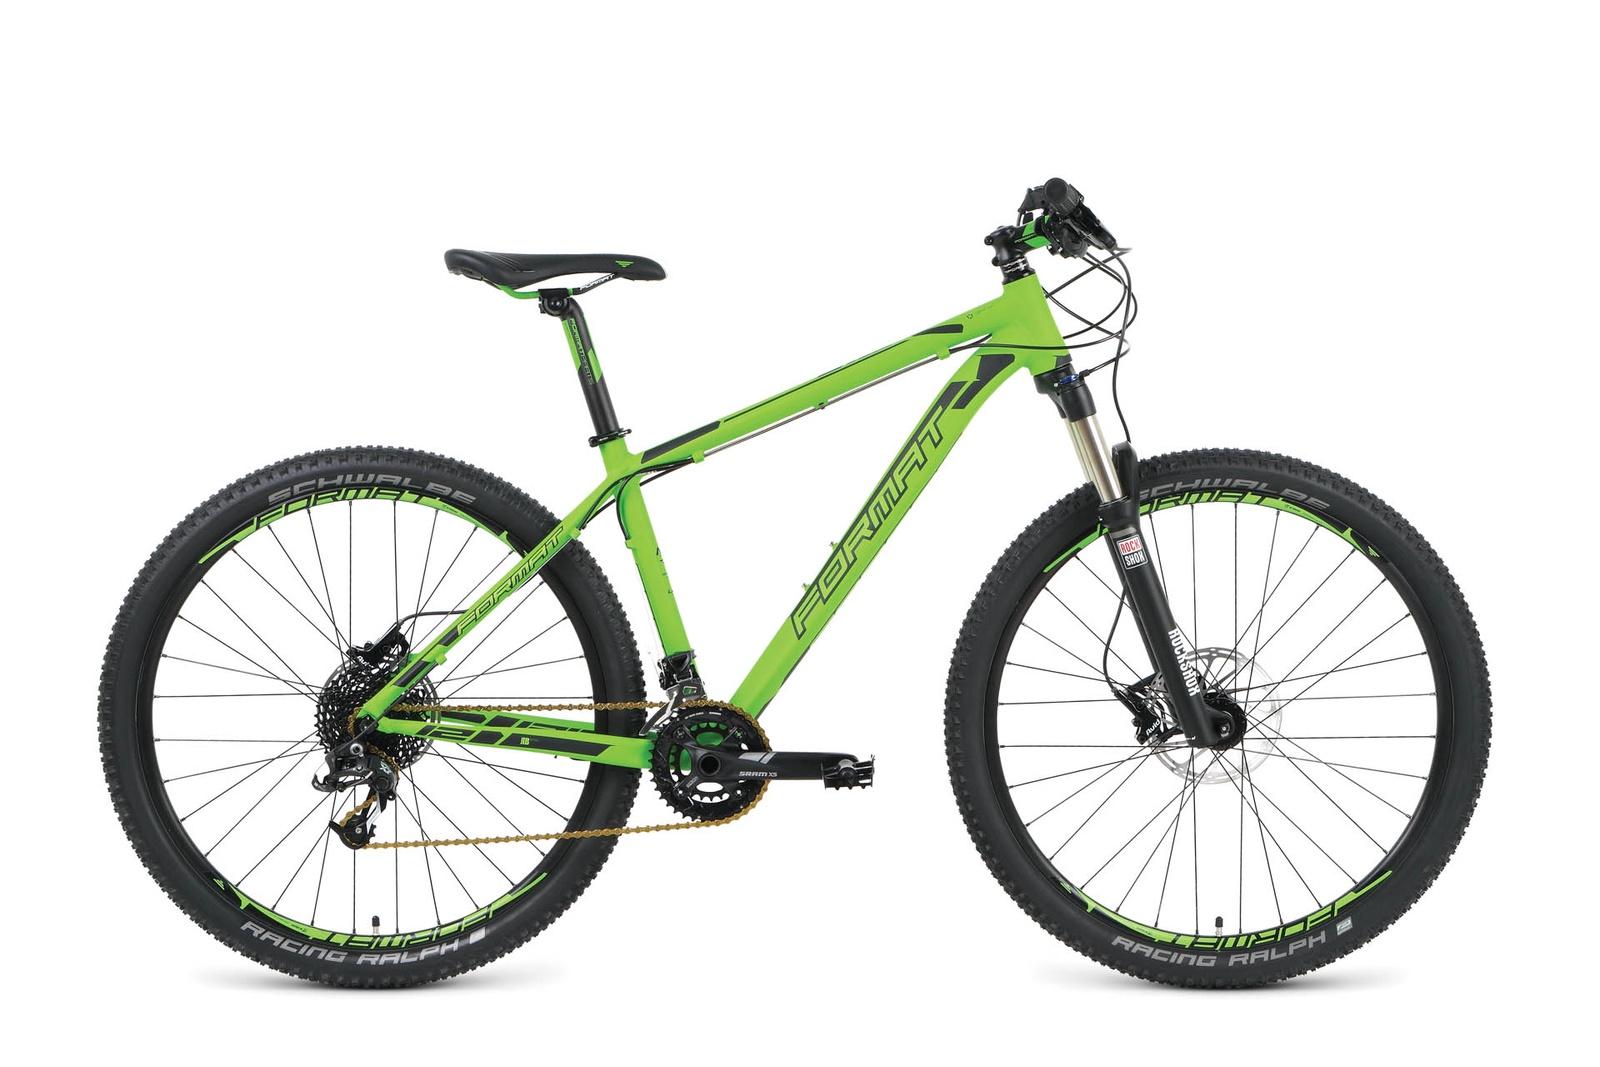 Велосипед Format RBKM9M69D002, зеленый велосипед format 1212 elite 27 2016